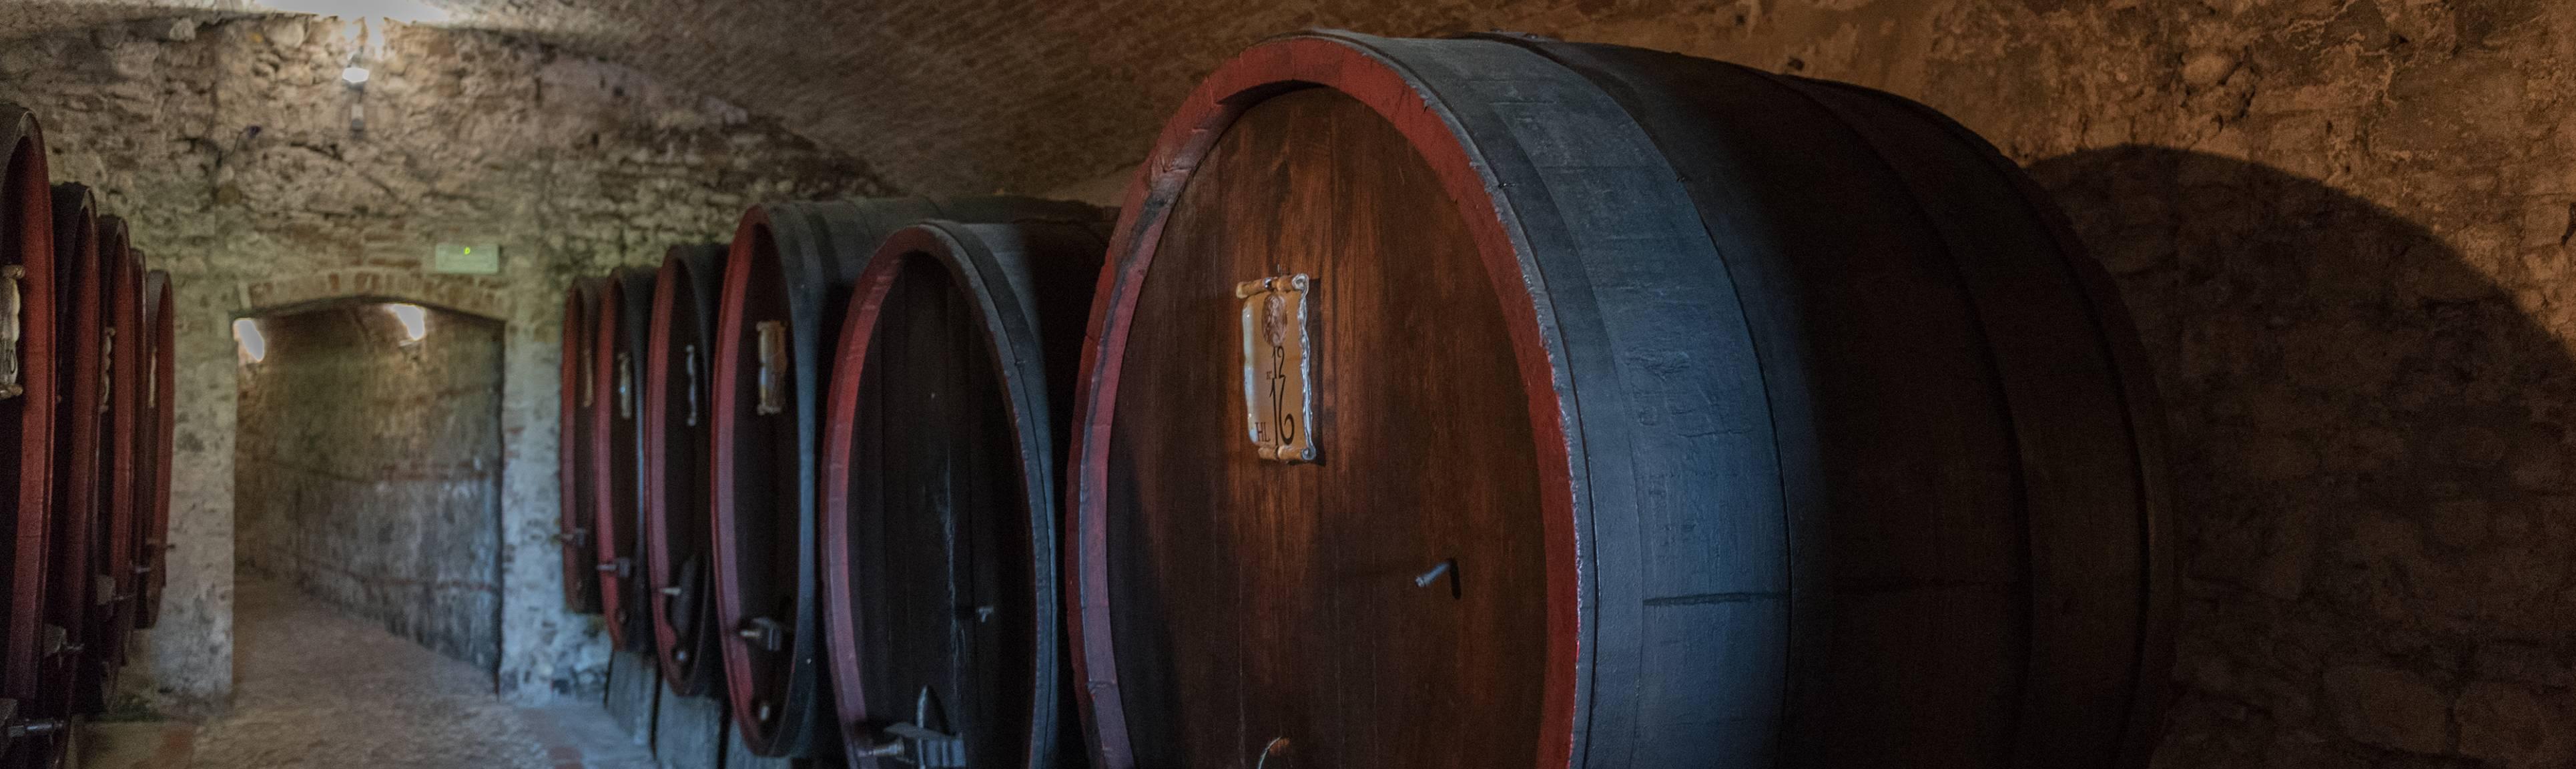 Wooden wine barrels line the cellar at Castello Banfi Wine estate